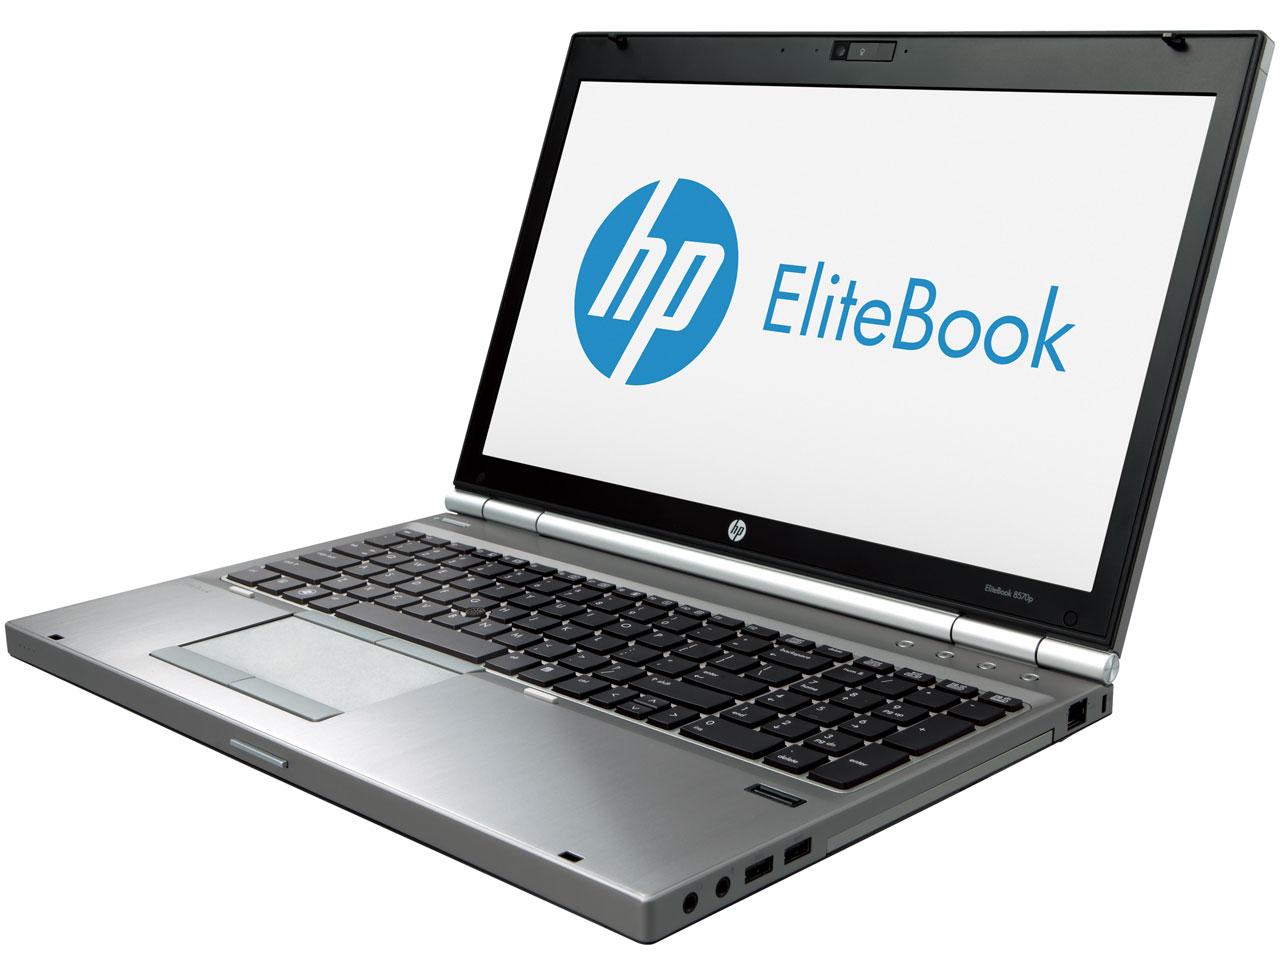 LAPTOP HP 8570p i5-3320M 2.6GHz RAM 4GB Ổ CỨNG HDD 320GB AMD Radeon HD 7540M 15.6 INCH 98% LIKE NEW